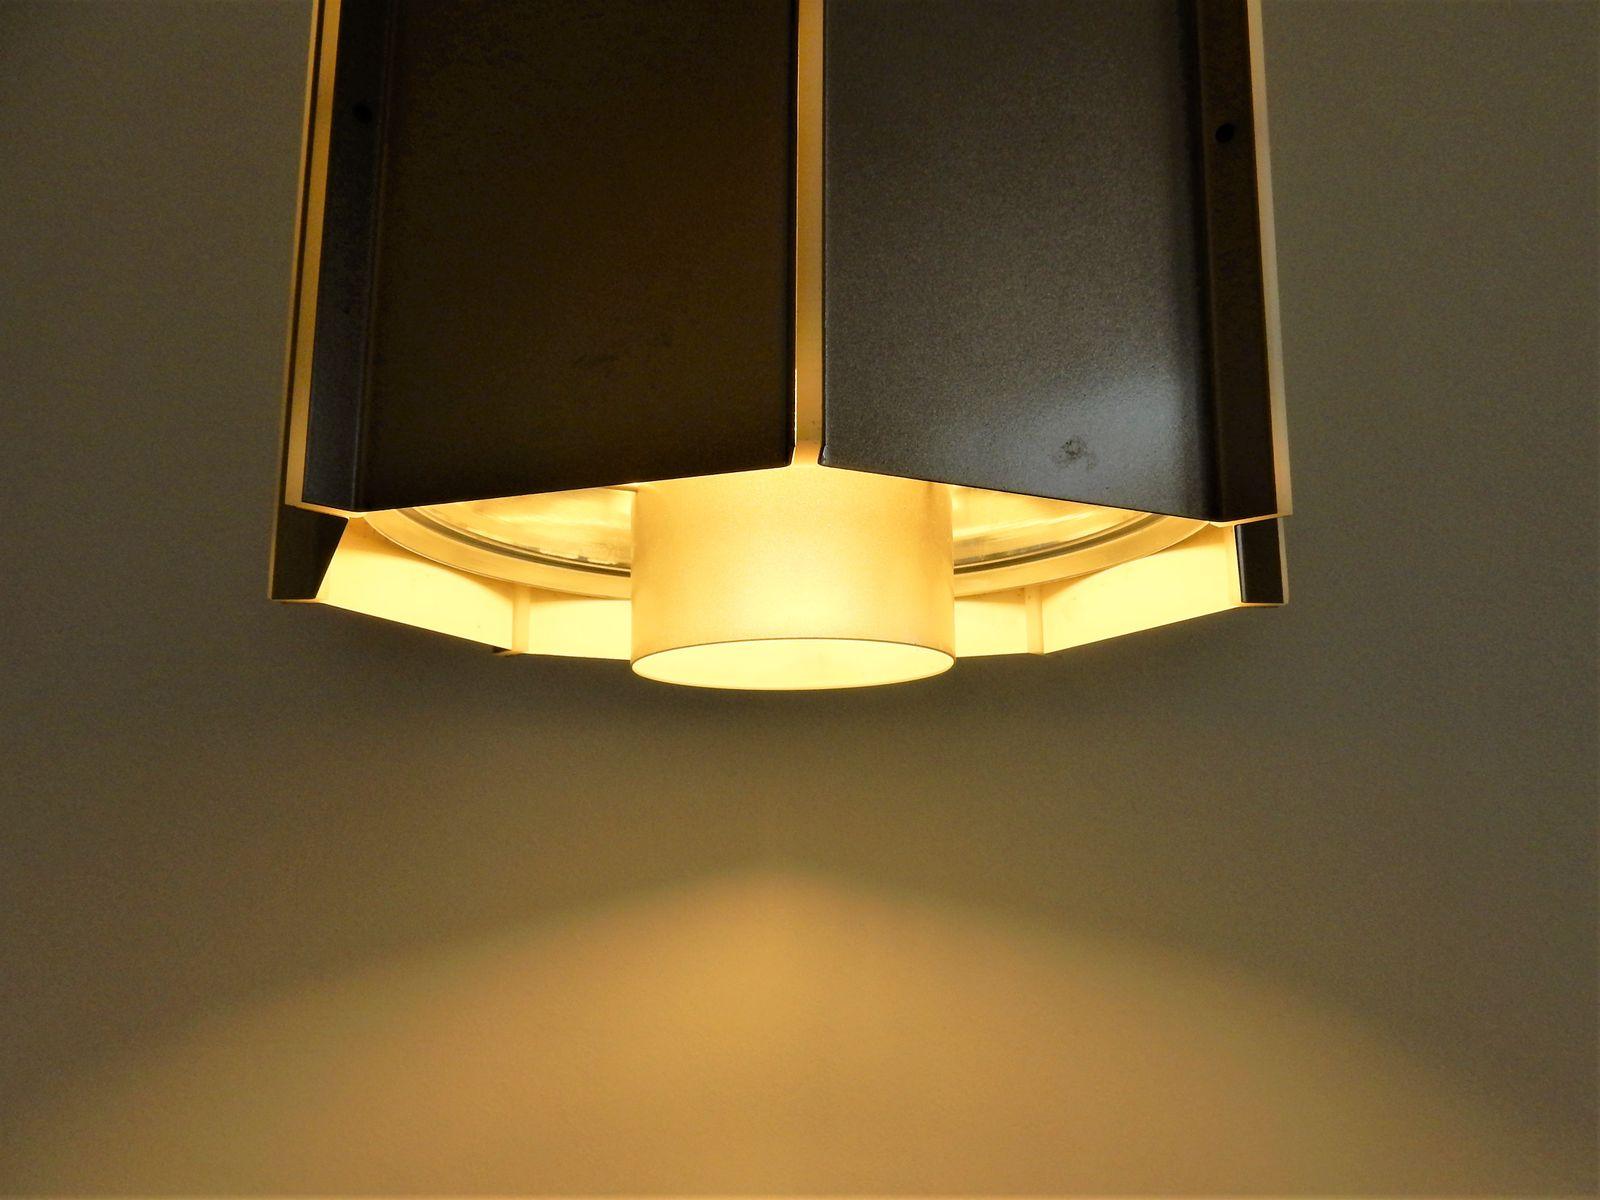 Lampada Vintage Industriale : Lampada a sospensione grande b 1011.0000 vintage industriale di raak